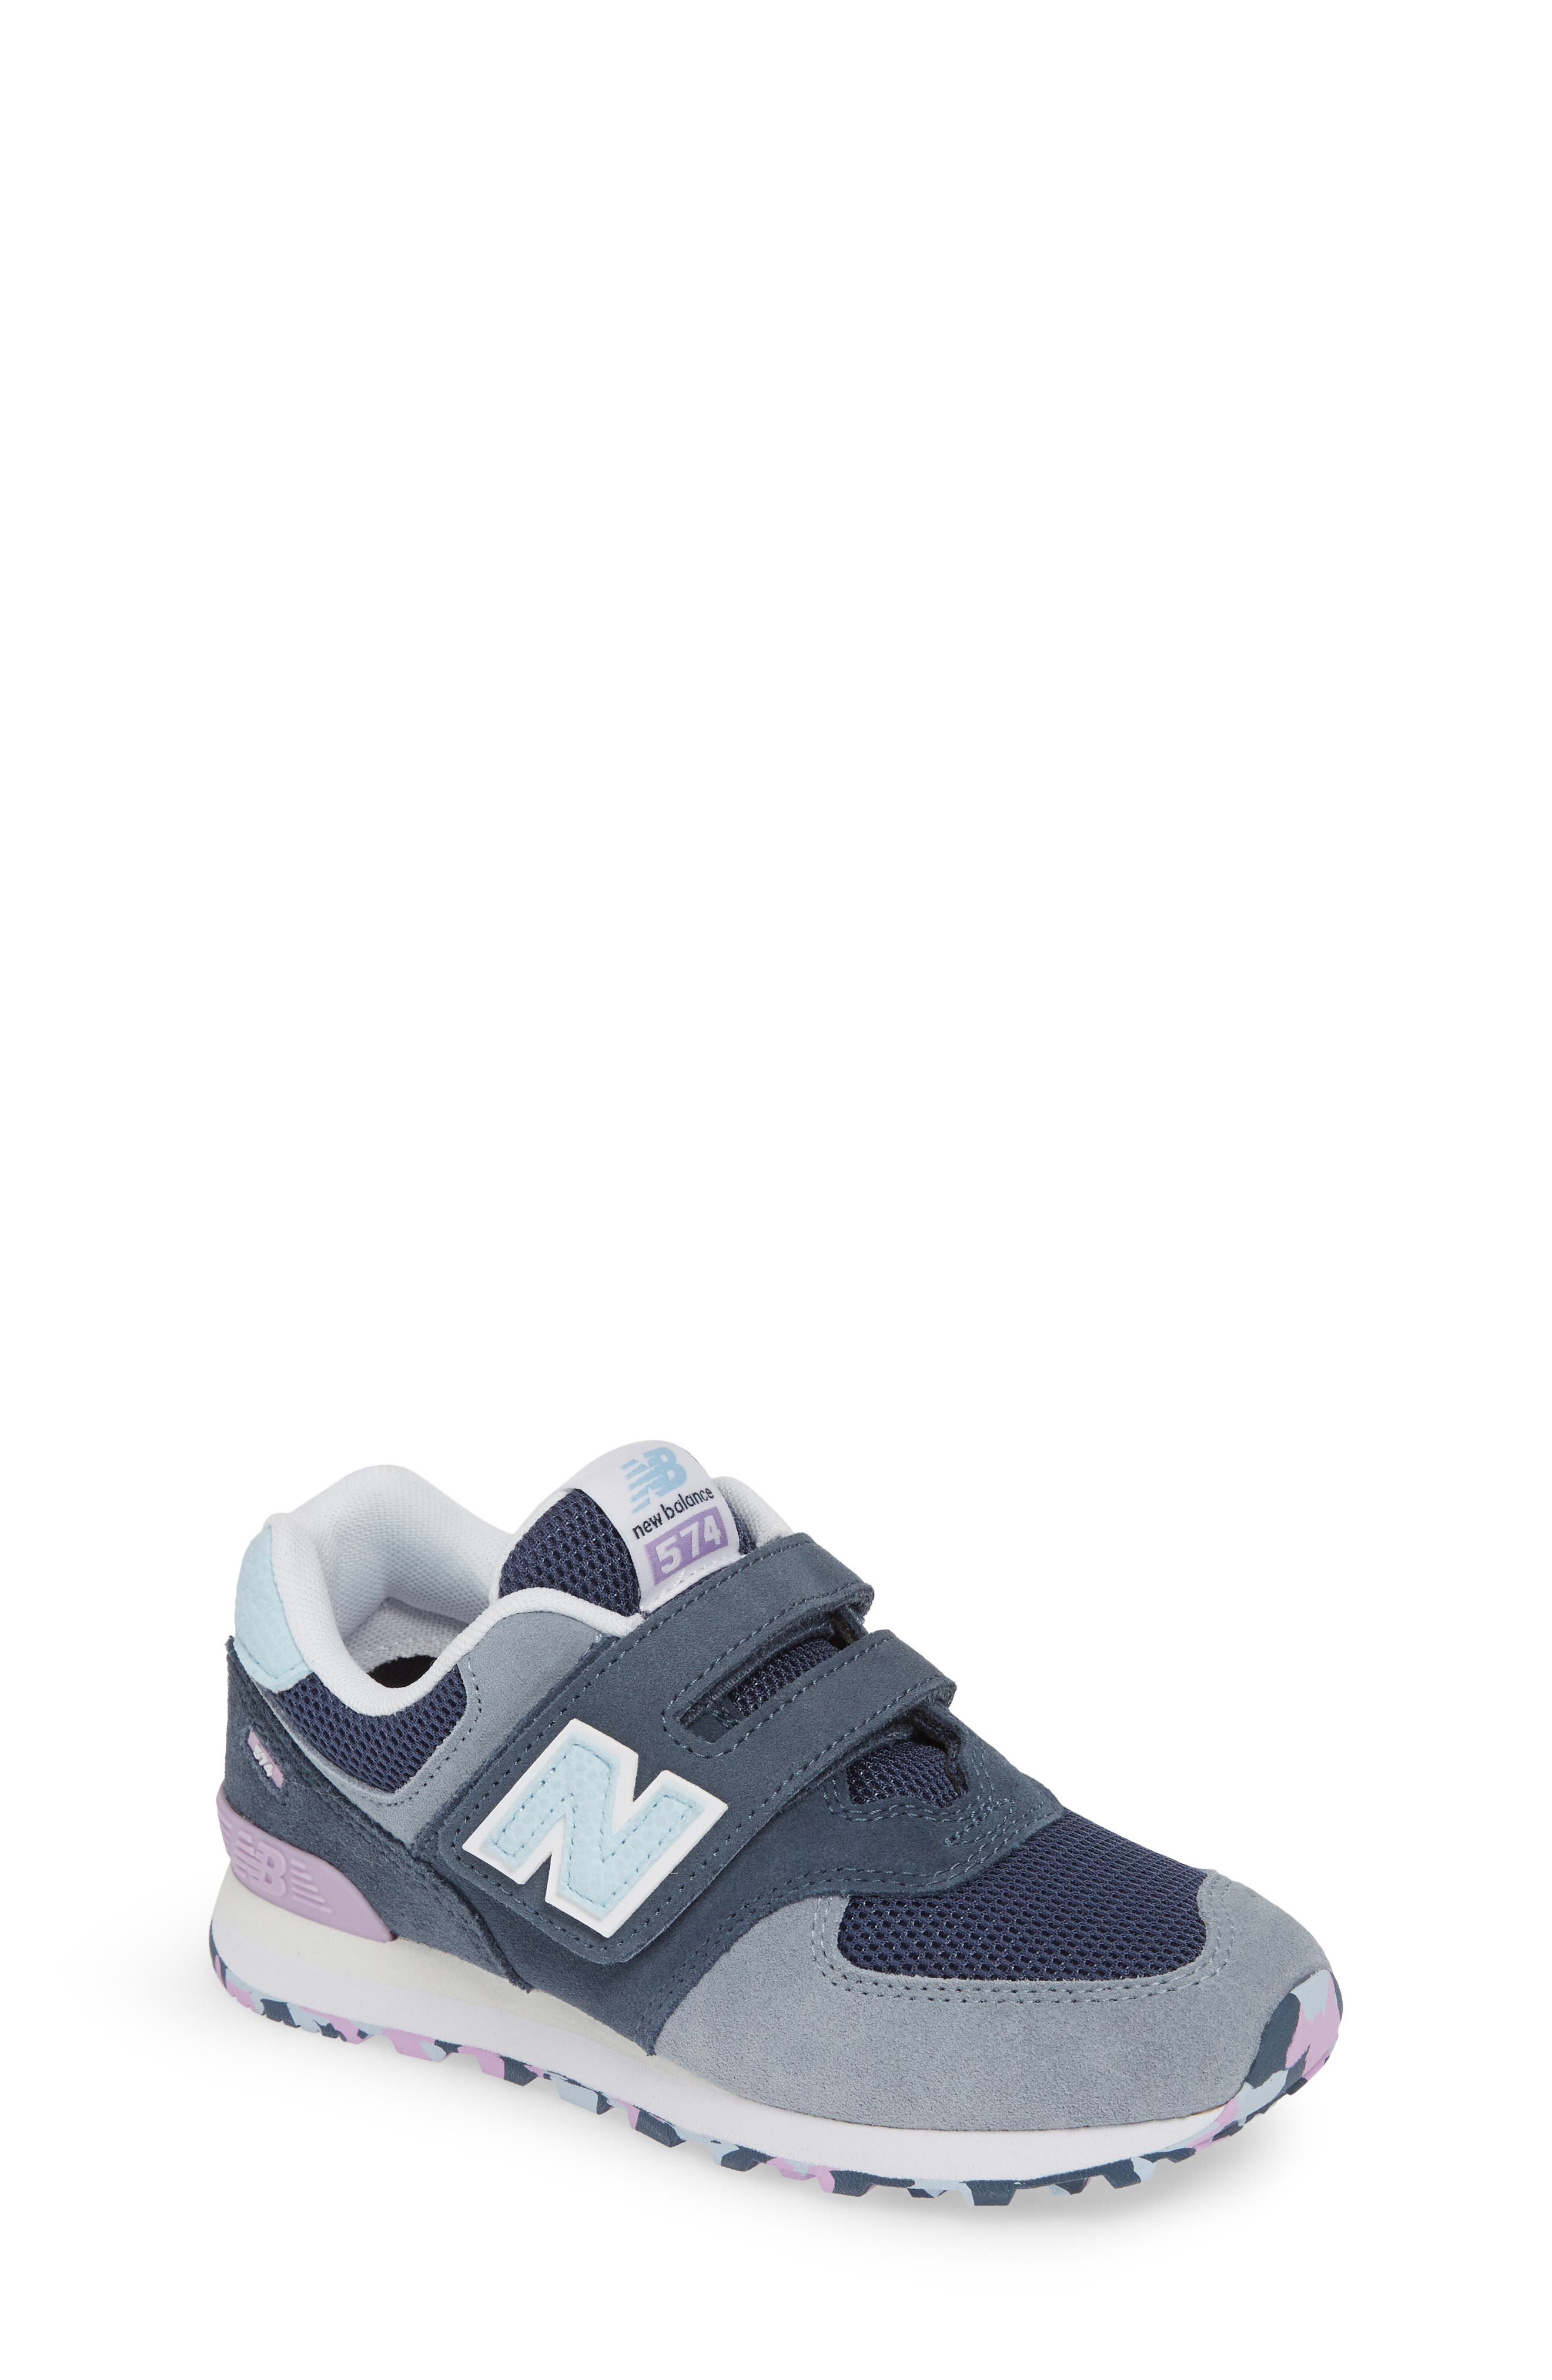 Boys New Balance 574 Retro Surf Sneaker Size 15 W  Blue